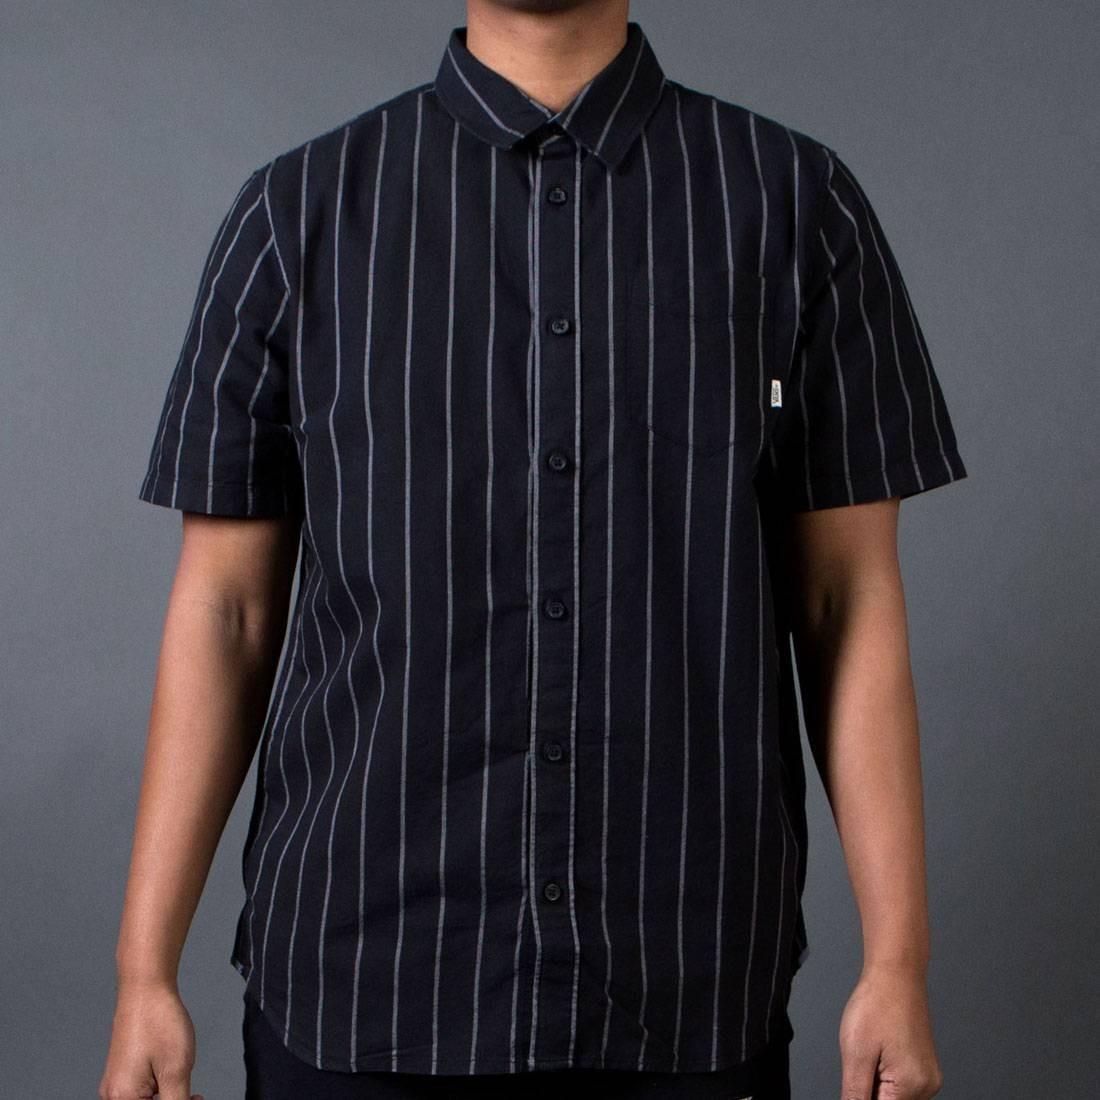 Vans Men GC Stripe Shirt (black / frost gray)